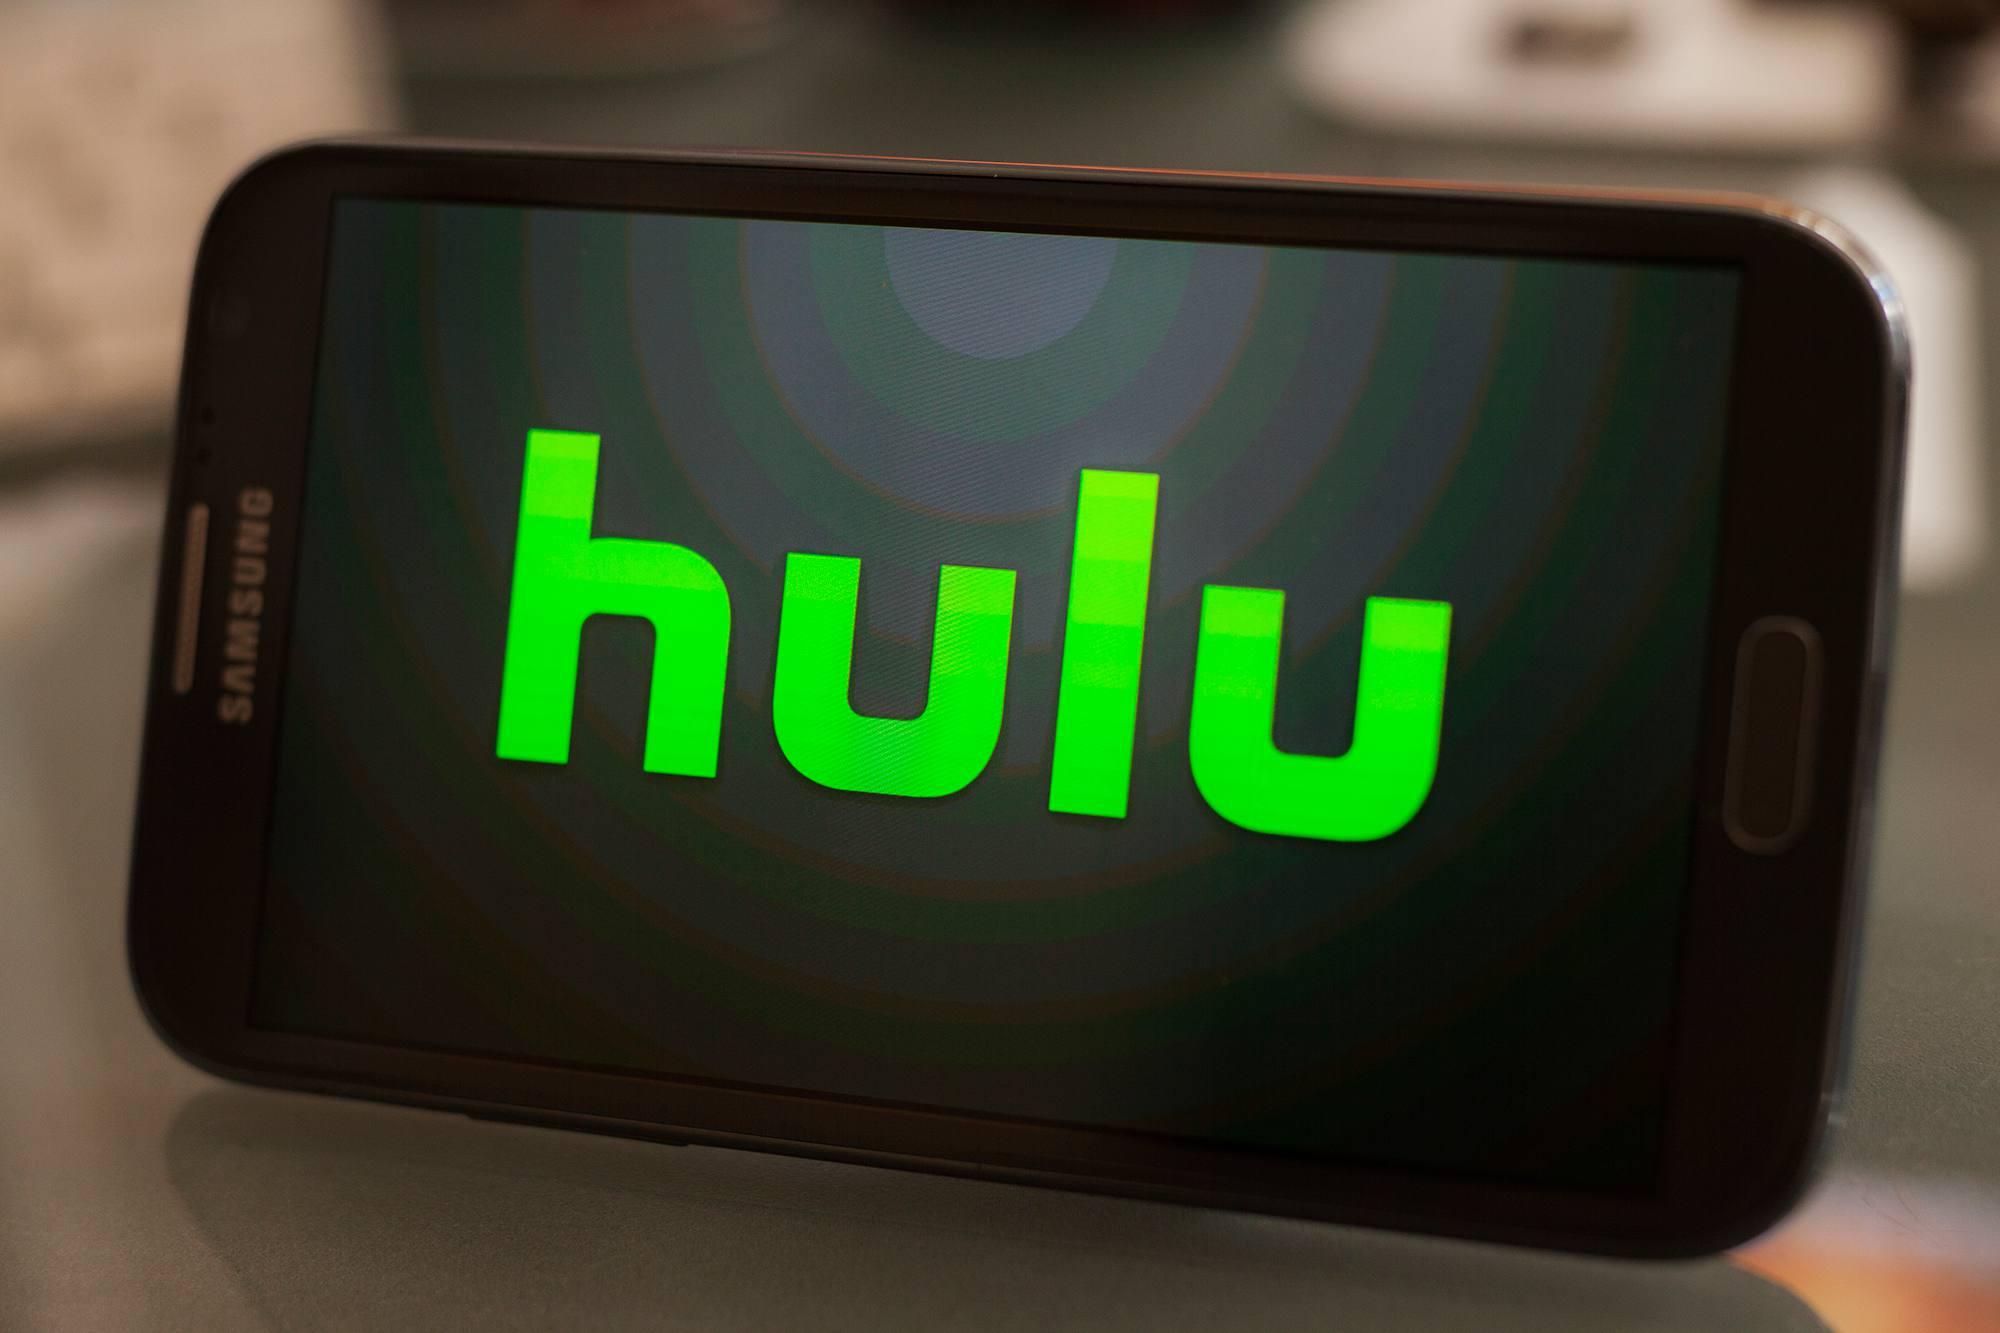 Hulu logo on Samsung mobile phone screen